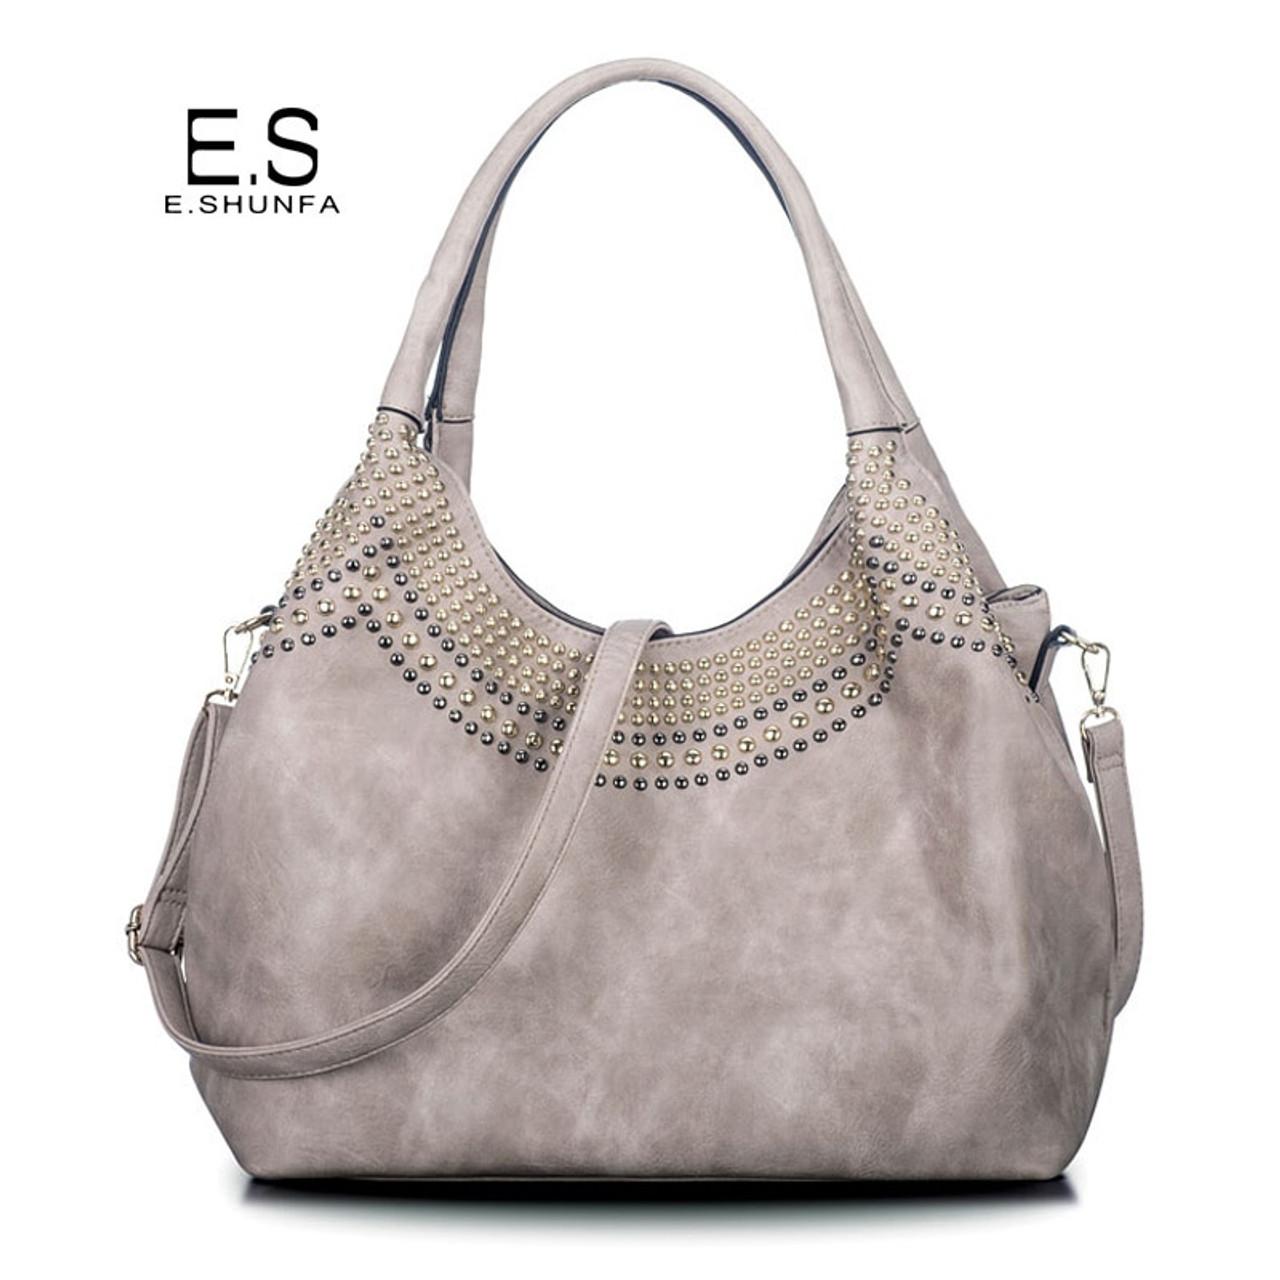 d50f58dc91cc Beading Shoulder Bags Women 2018 New Fashion Casual Tote Bag Handbag Hobos High  Quality PU Leather Shoulder Bag Large Capacity - OnshopDeals.Com